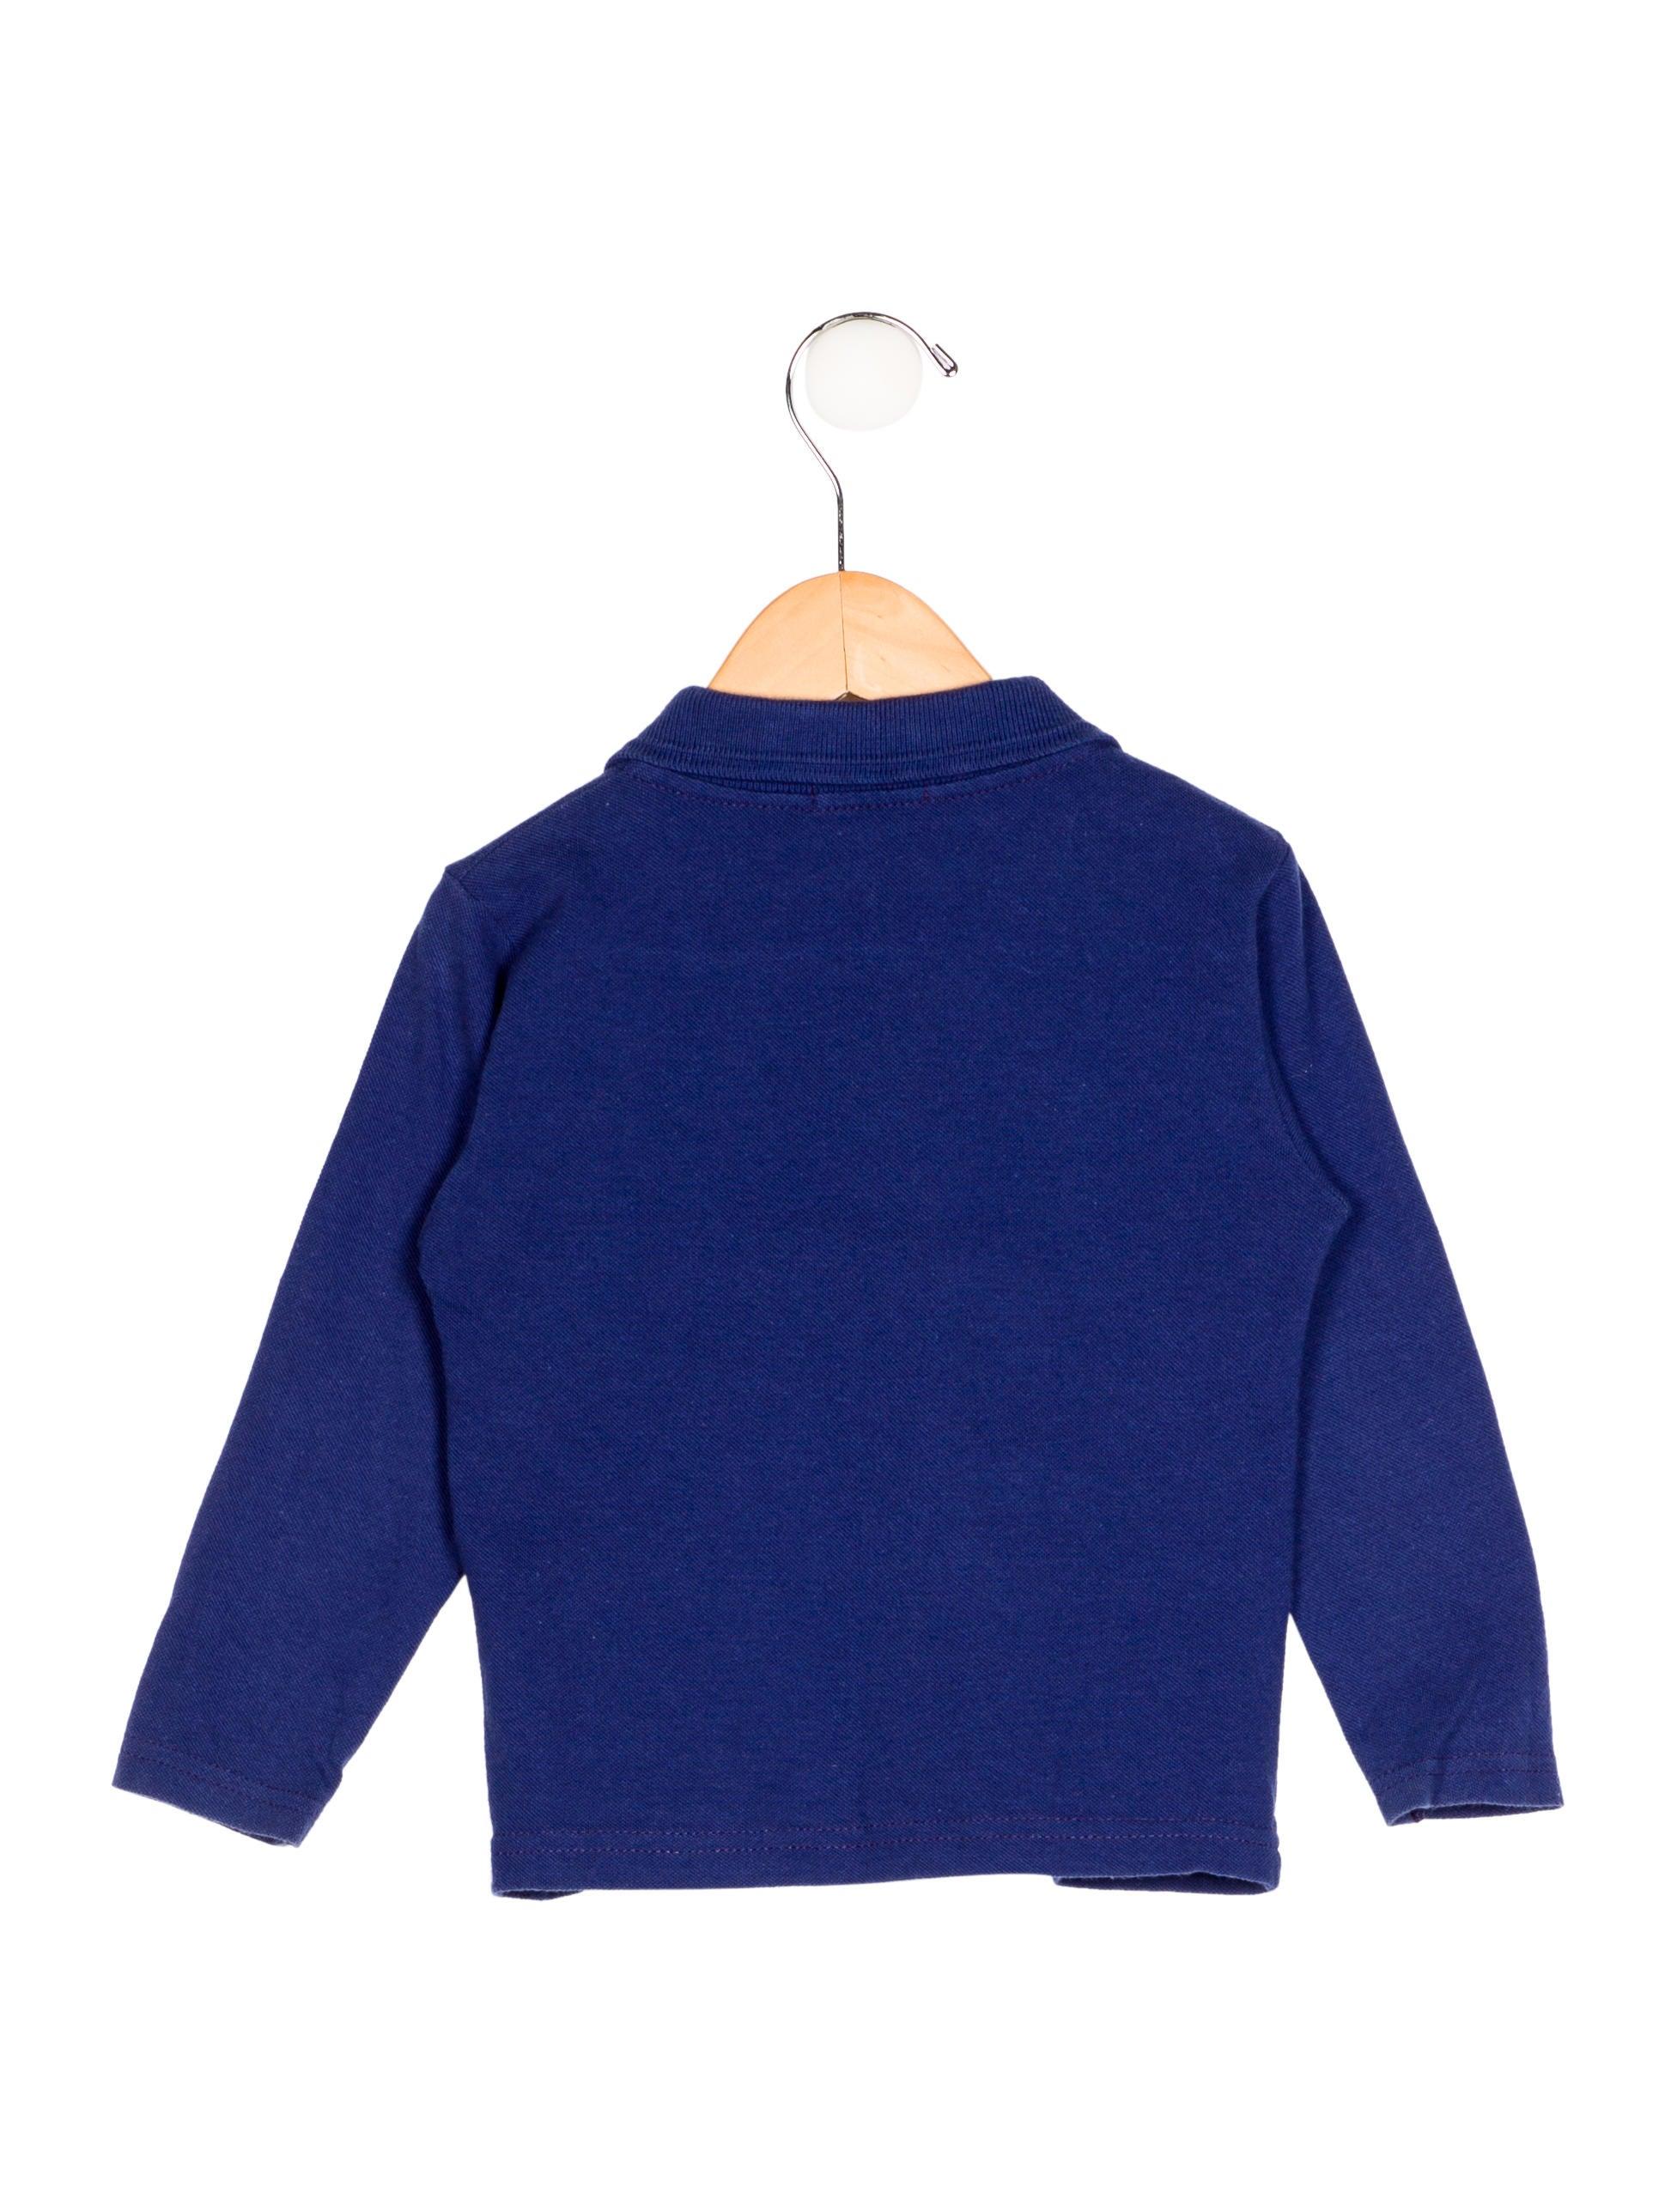 Young versace boys 39 long sleeve polo shirt boys for Long sleeved polo shirts for boys